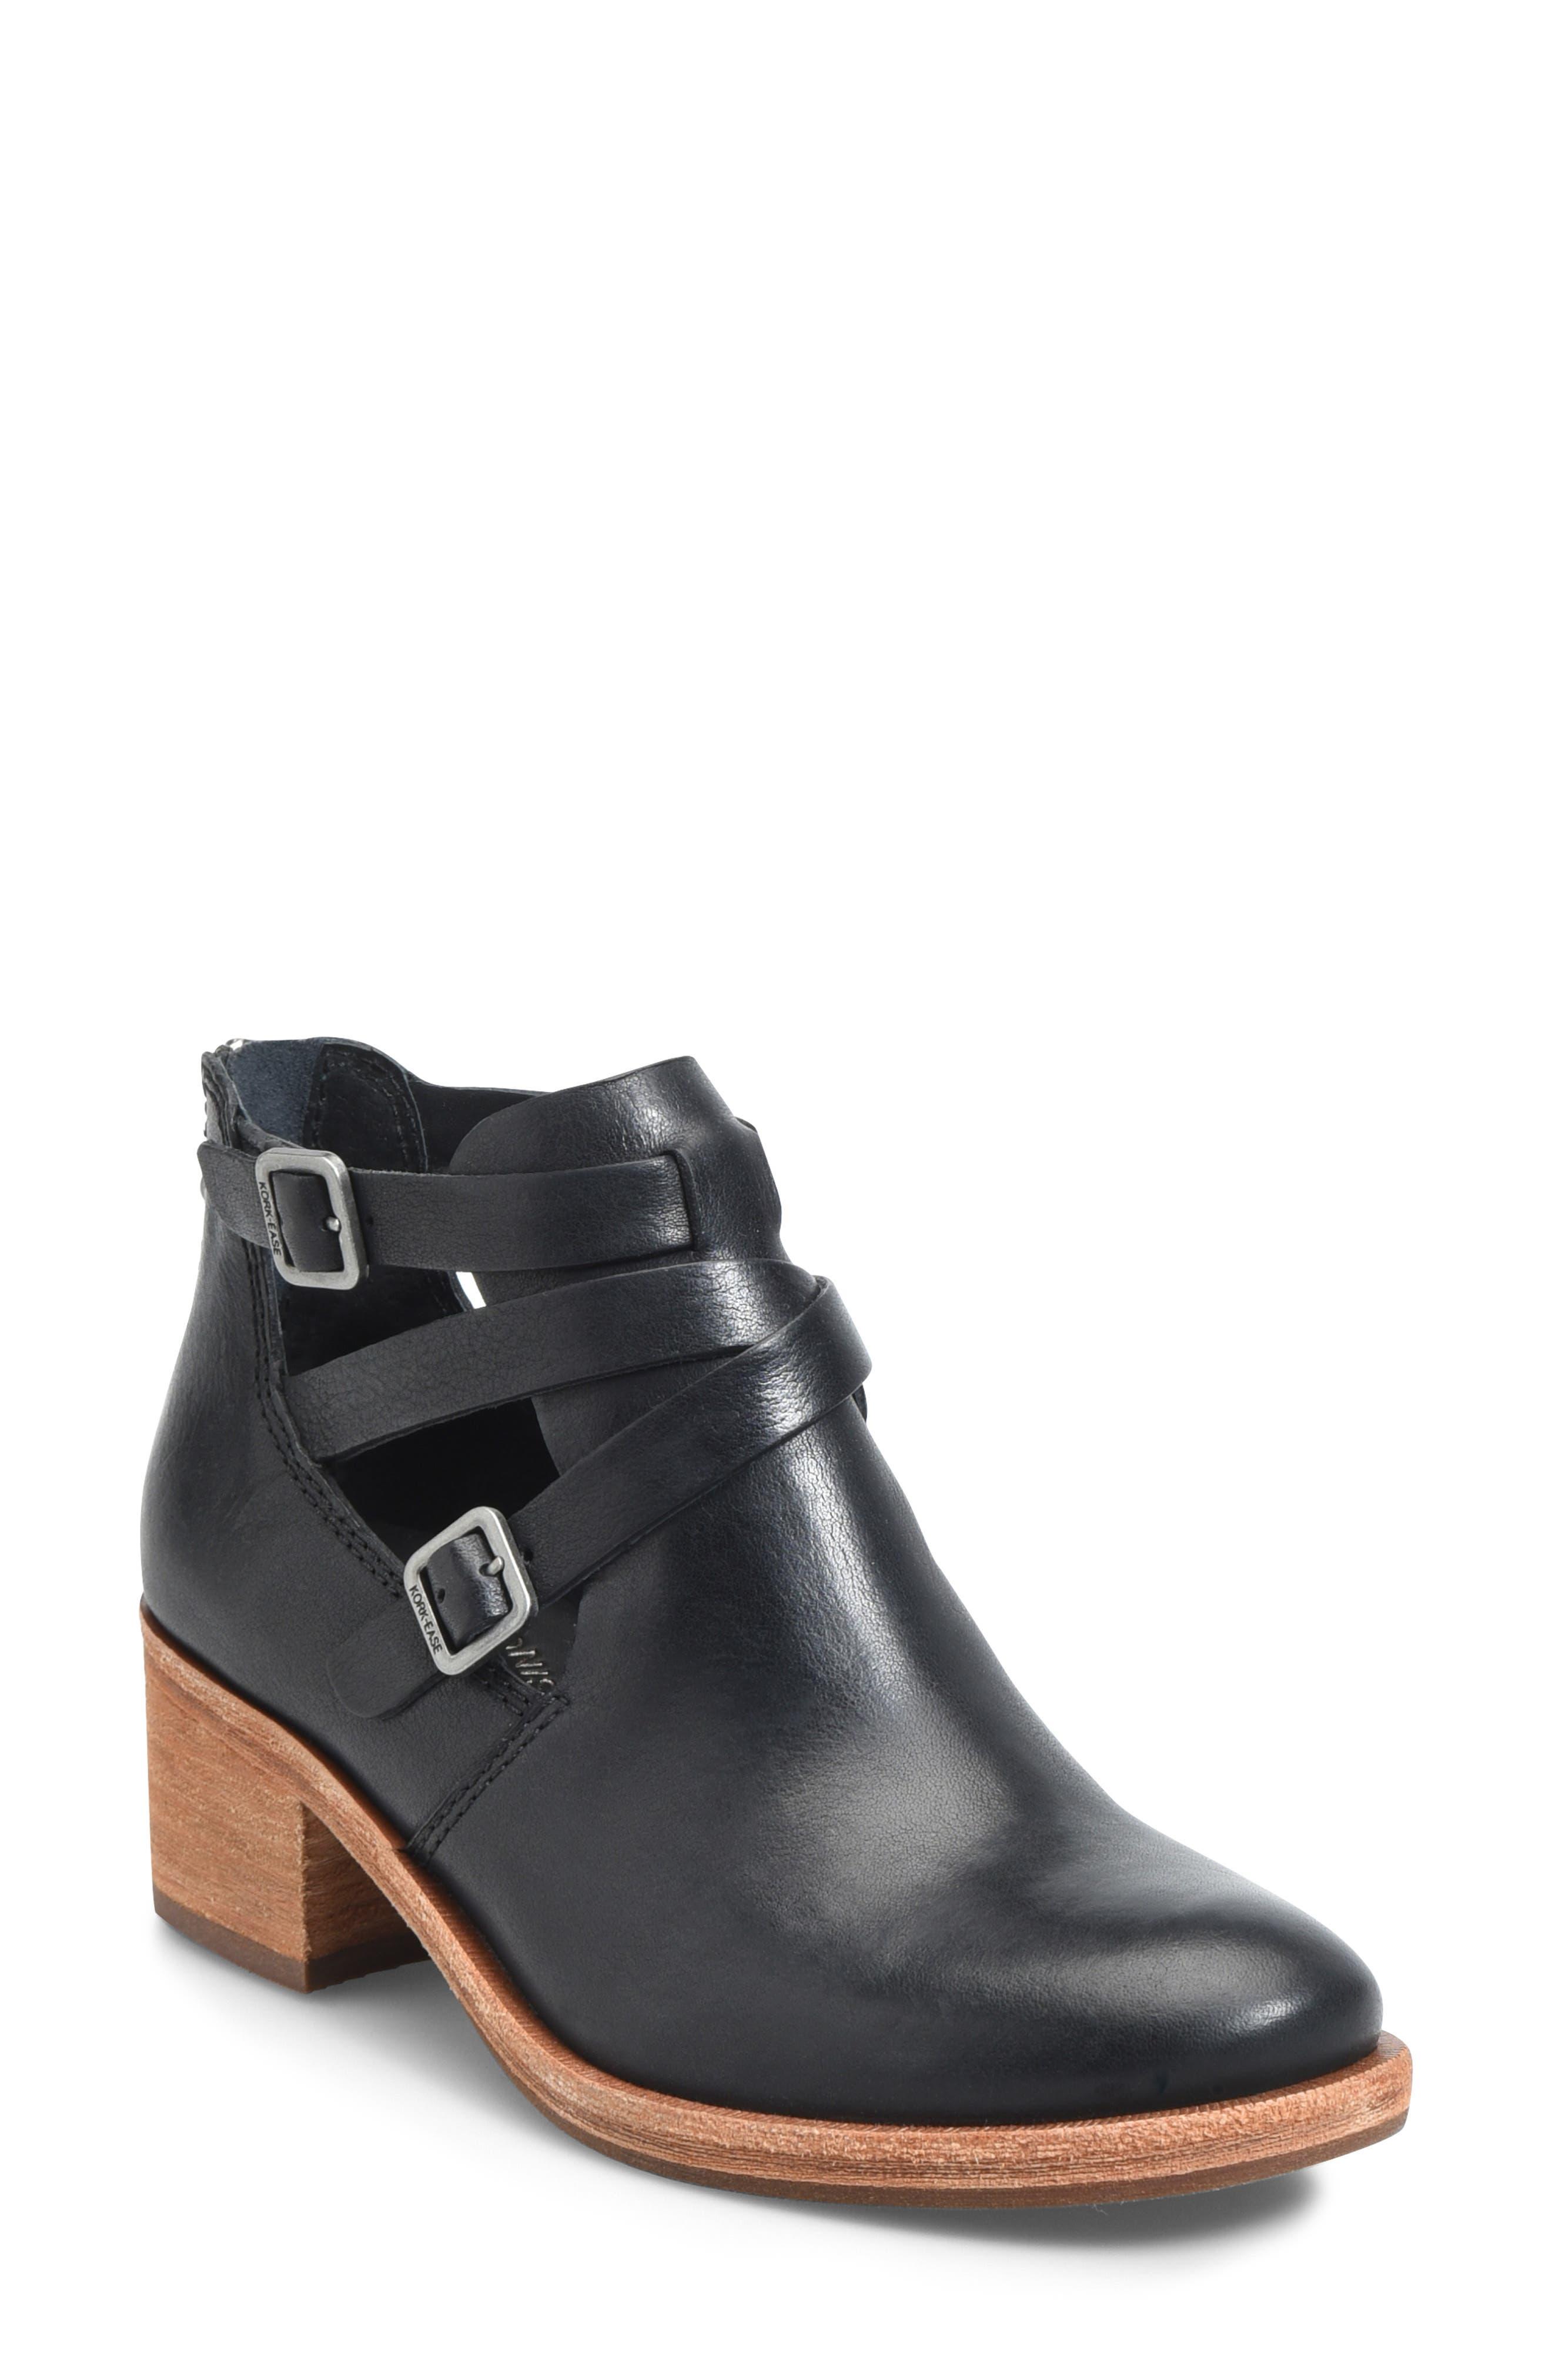 f2ea5d705ba9 Women s Kork-Ease® Booties   Ankle Boots